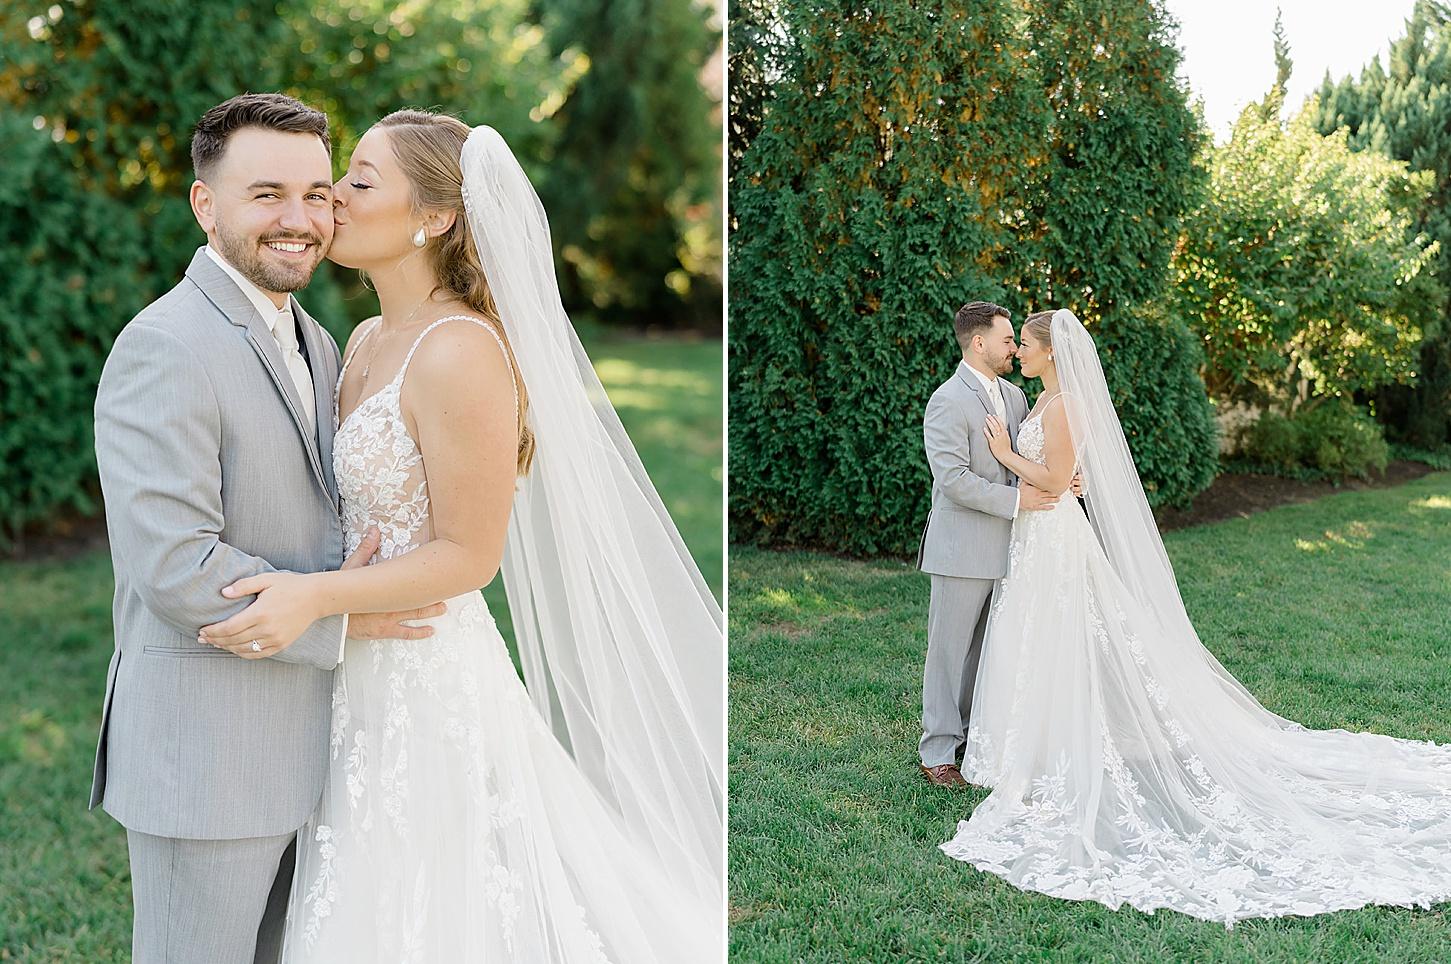 Valenzano Winery Vitners Pavillion Wedding Photography by Magdalena Studios 0008